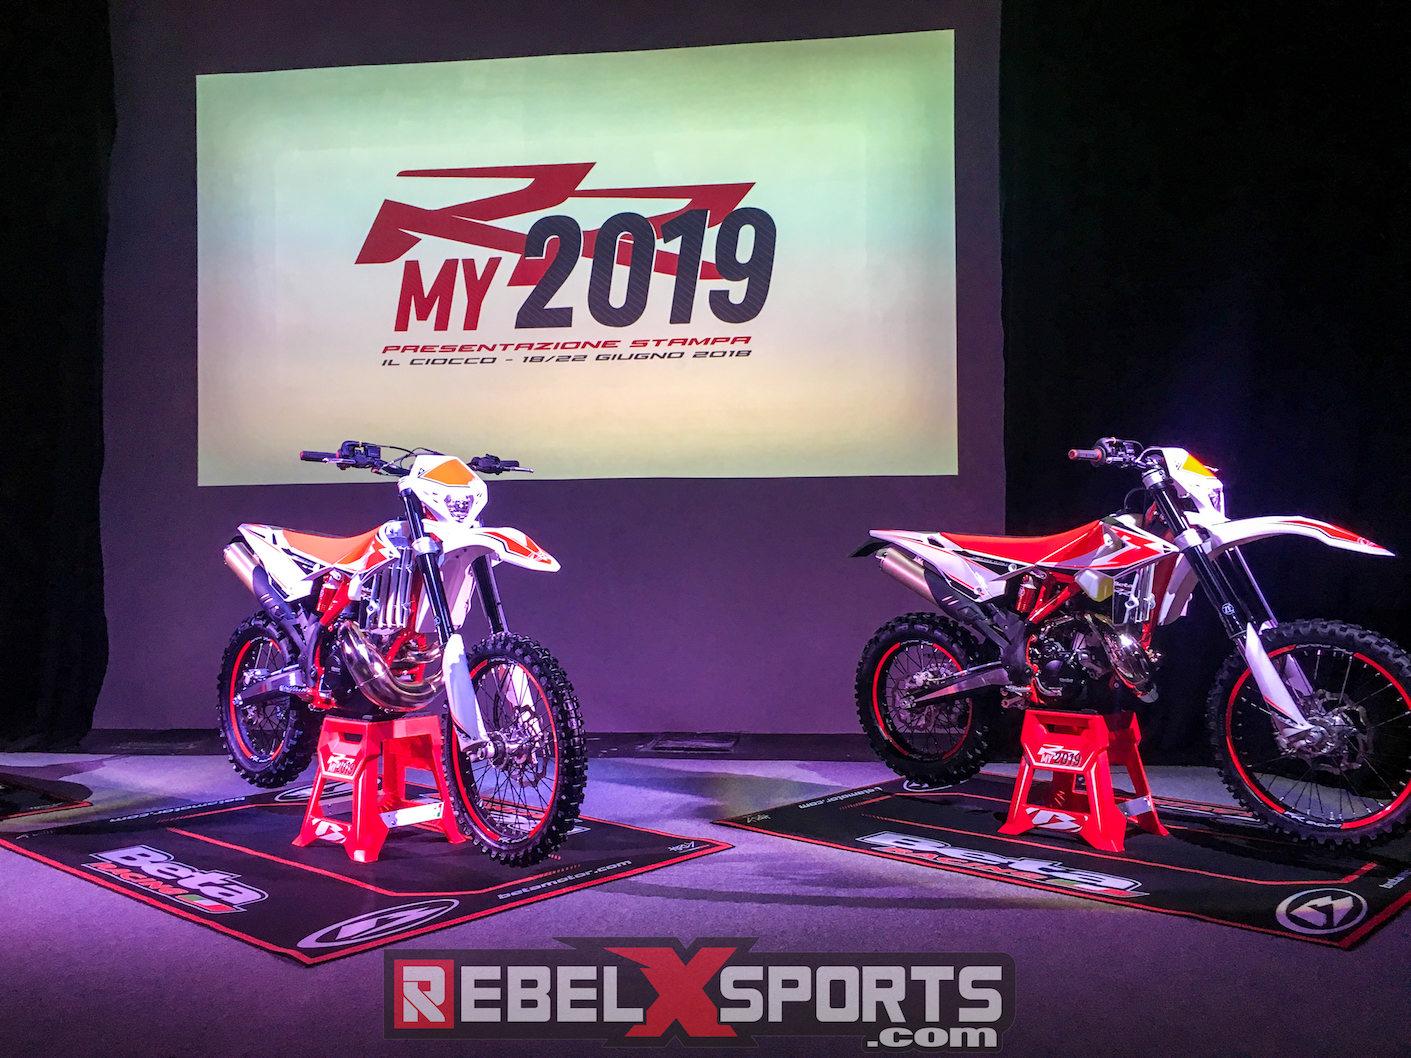 NEW 2019 BETA RR 200cc 2 Stroke and model range – Rebel X